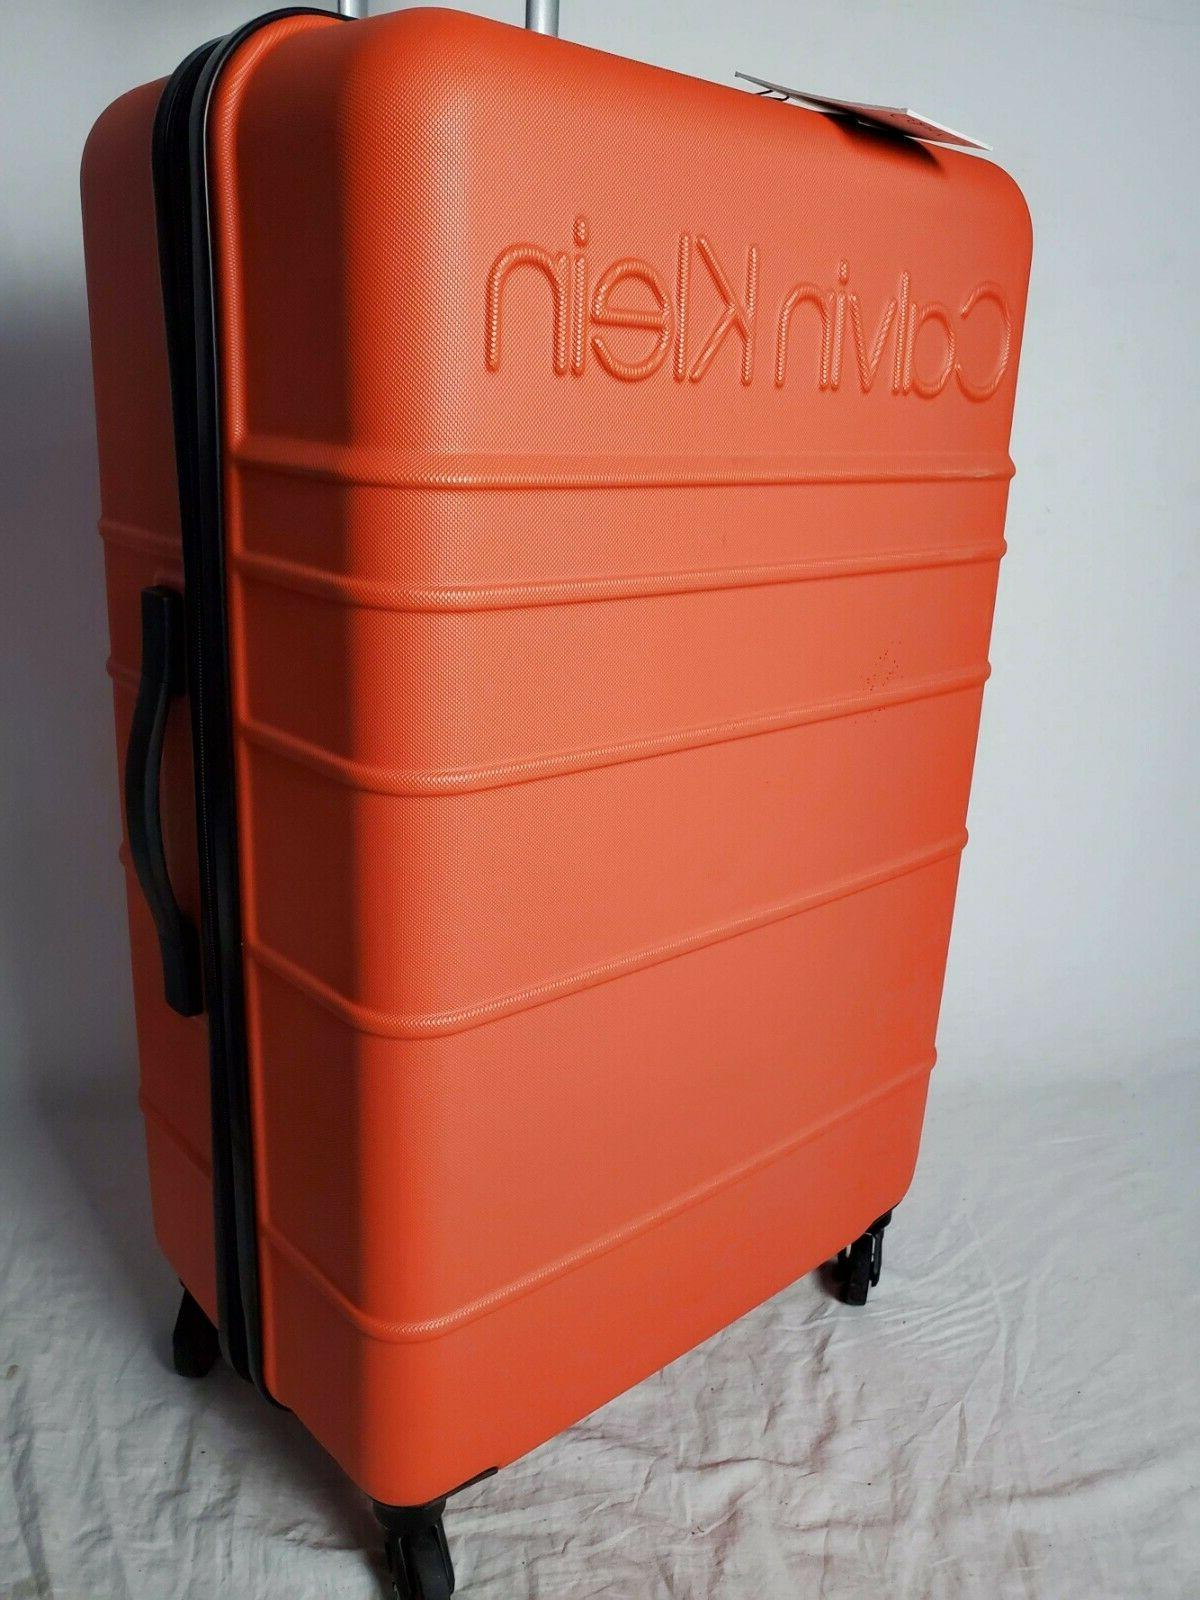 450 new fillmore 28 hard case luggage